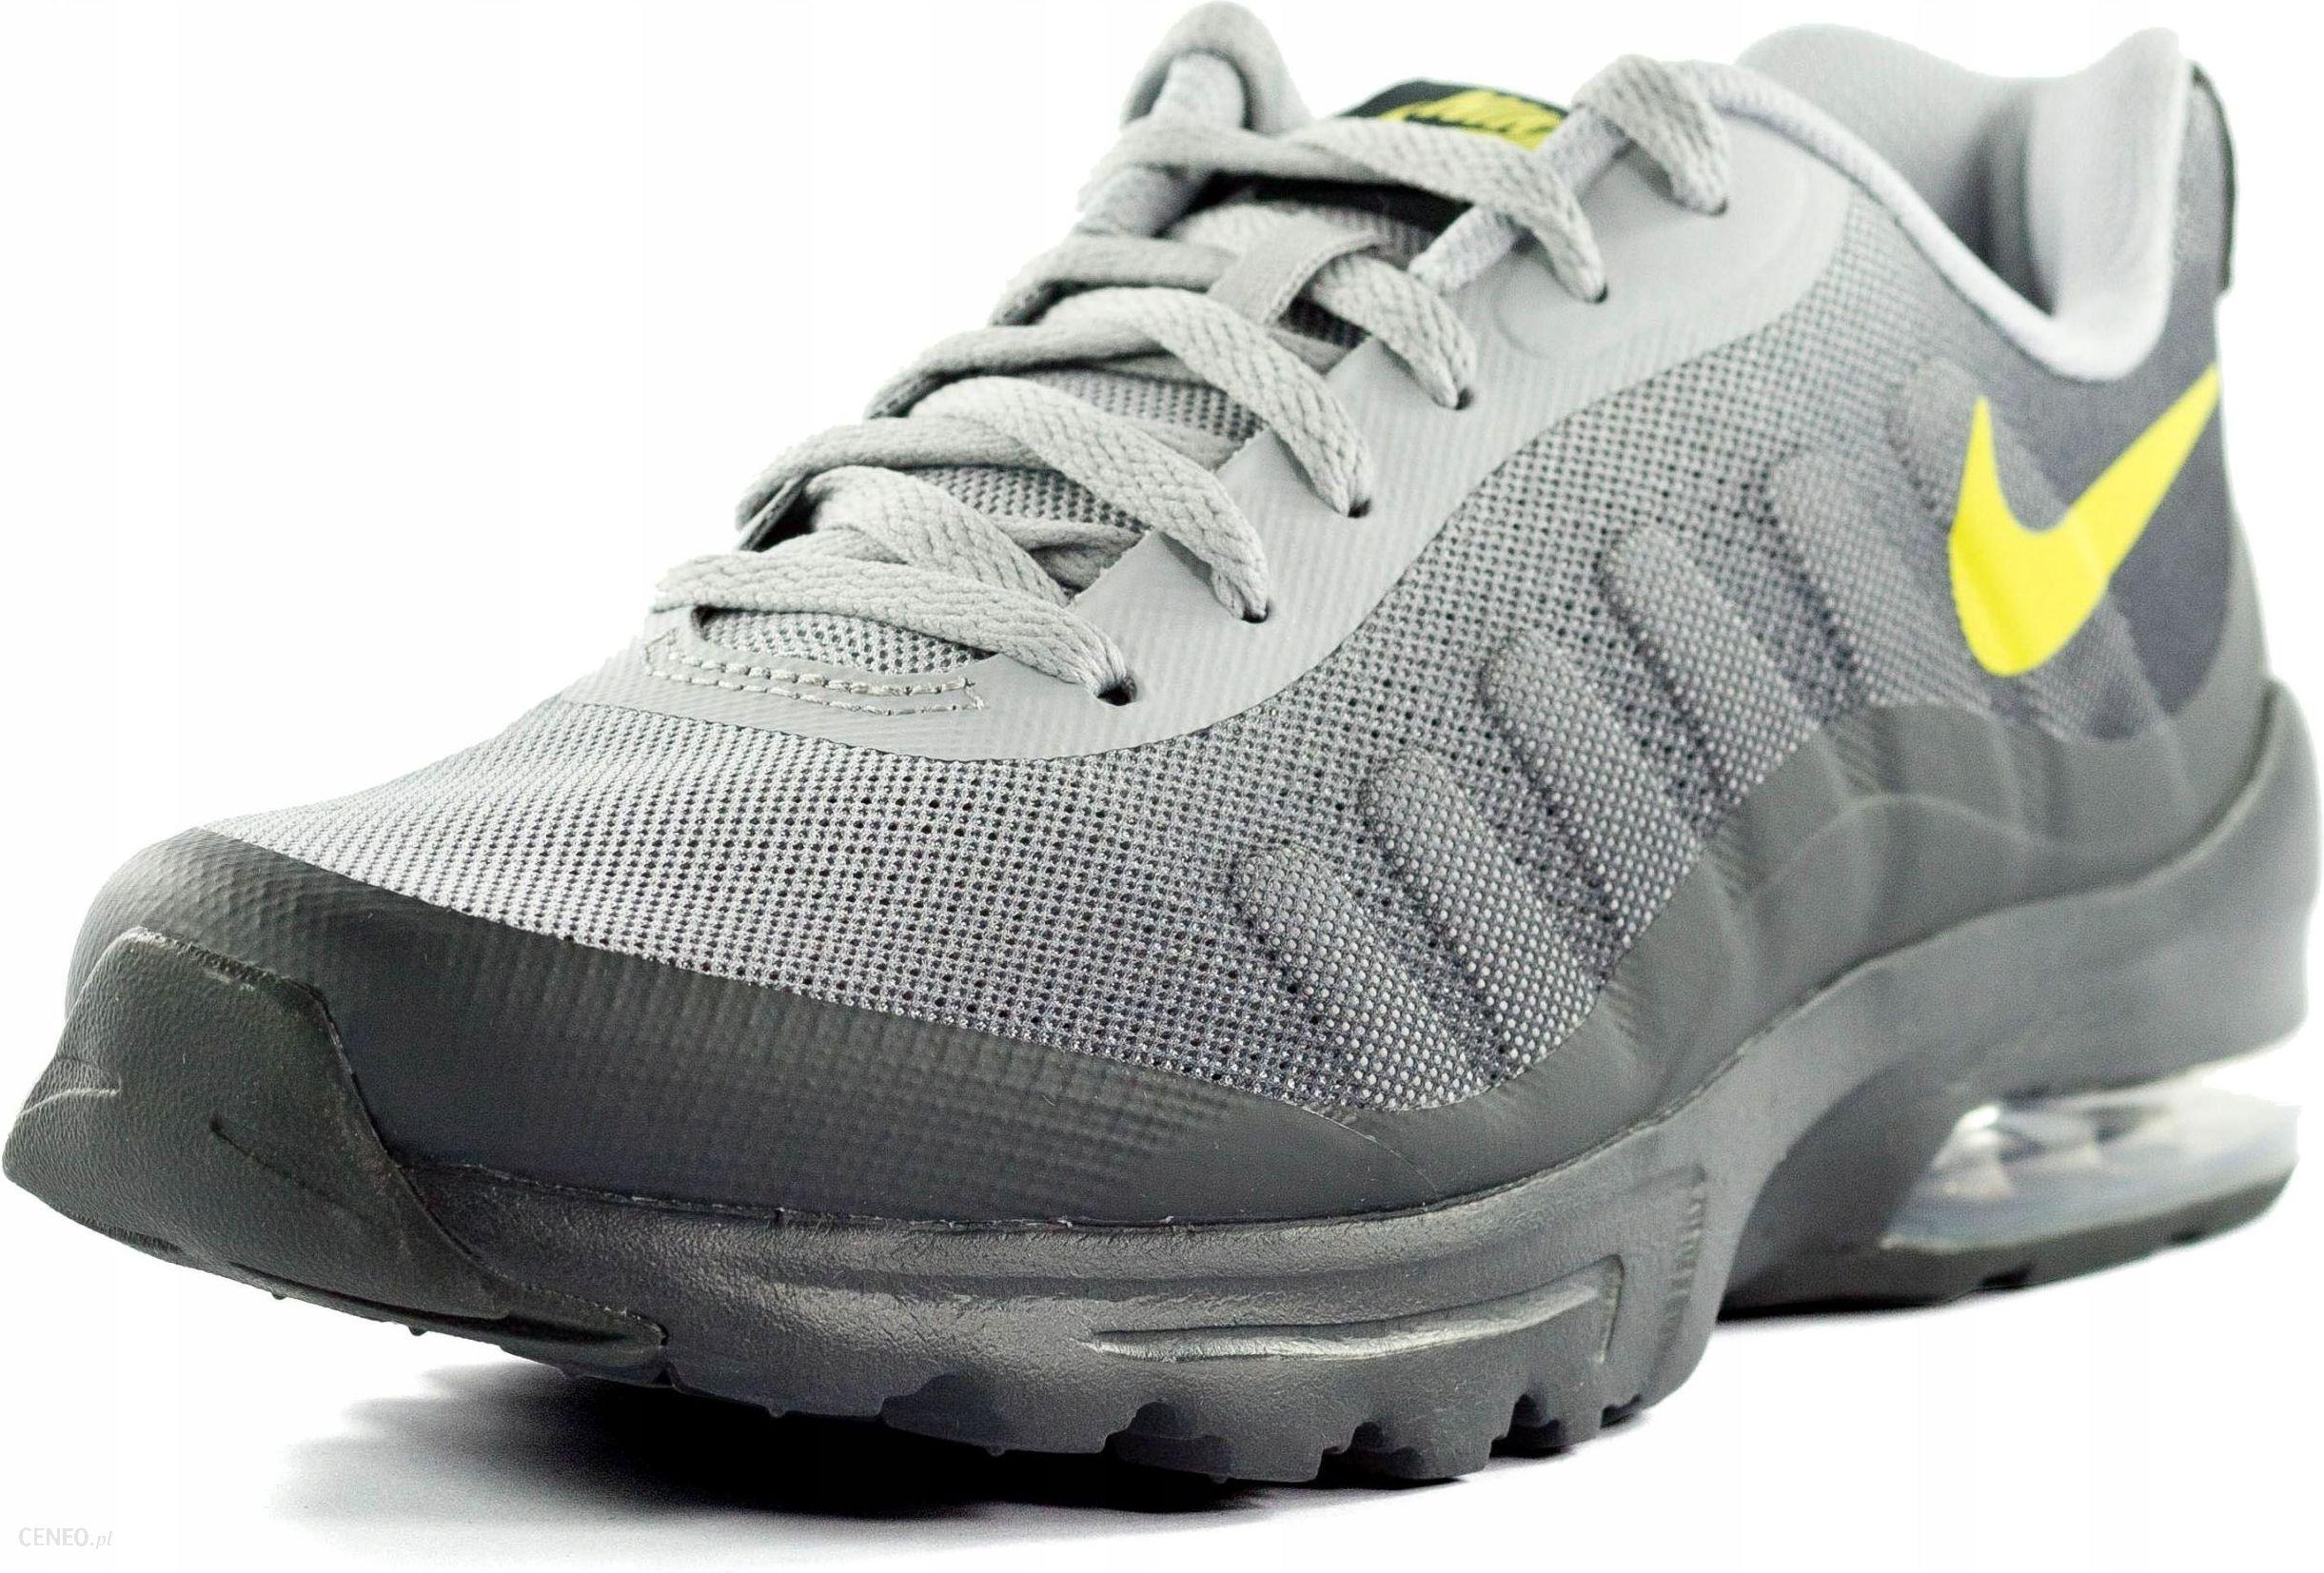 Buty sportowe męskie Nike Air Max Invigor Print (749688 004